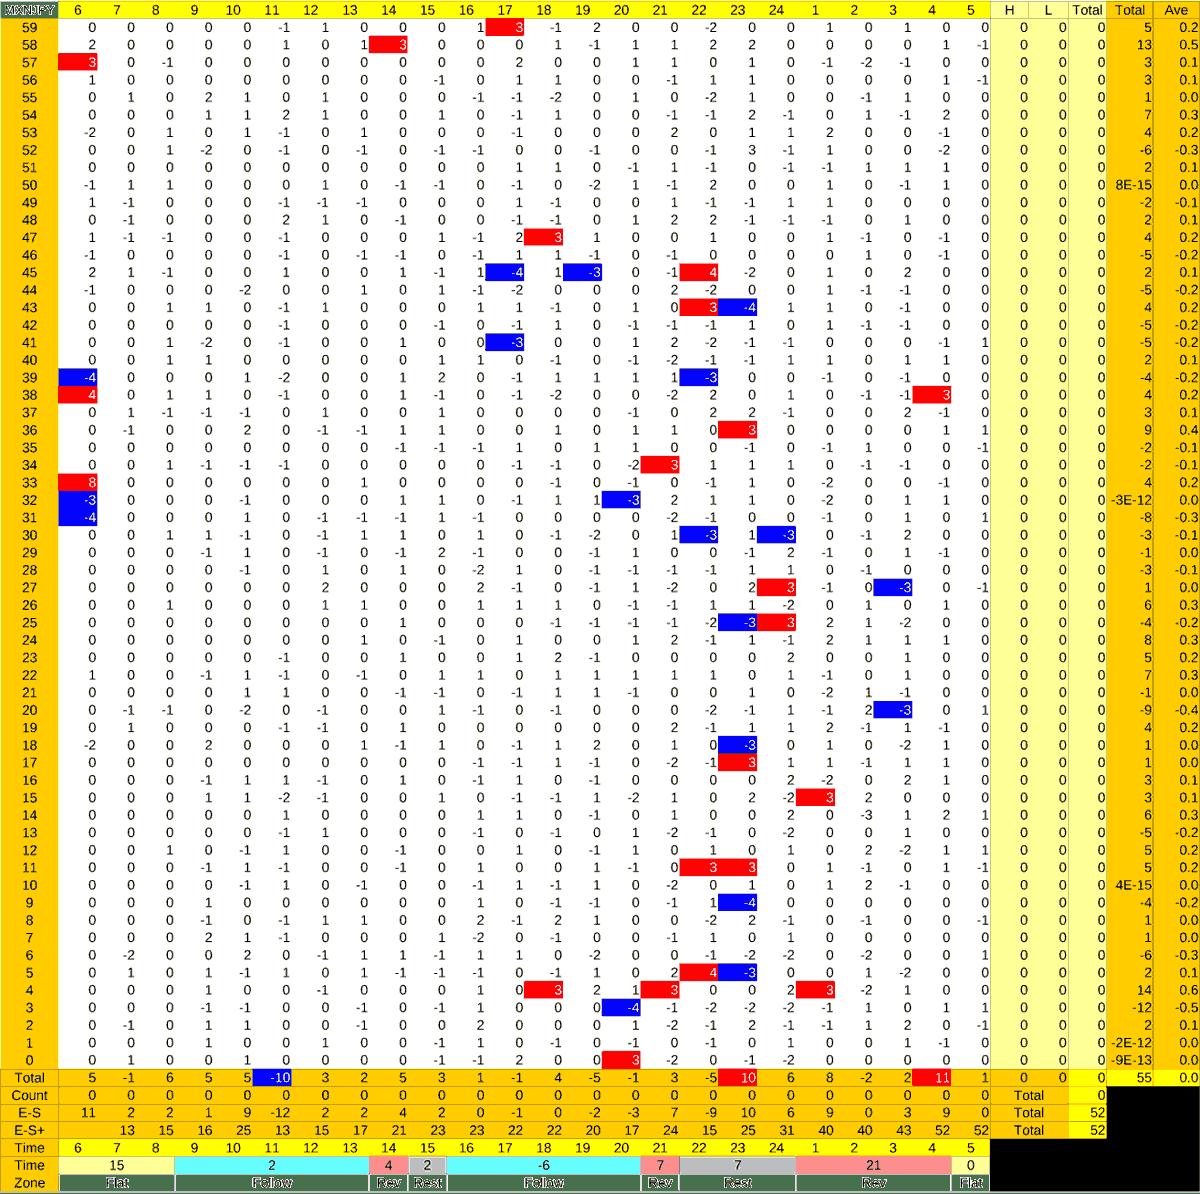 20210506_HS(3)MXNJPY